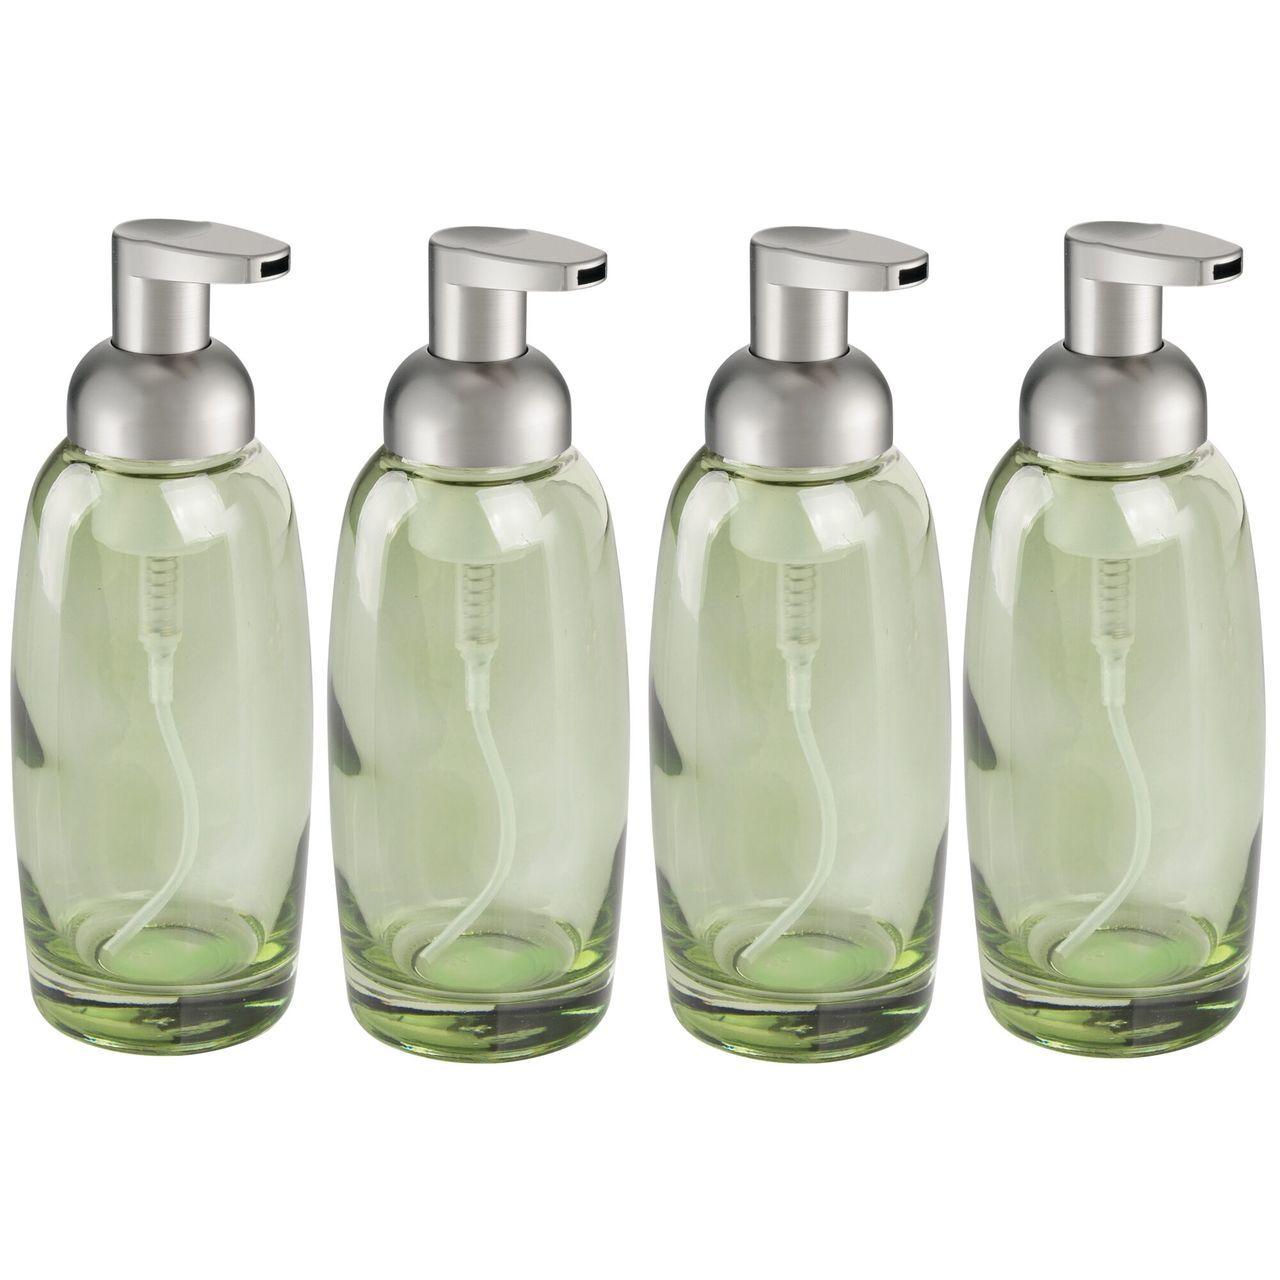 Modern Glass Refillable Foaming Soap Dispenser Pump In Green